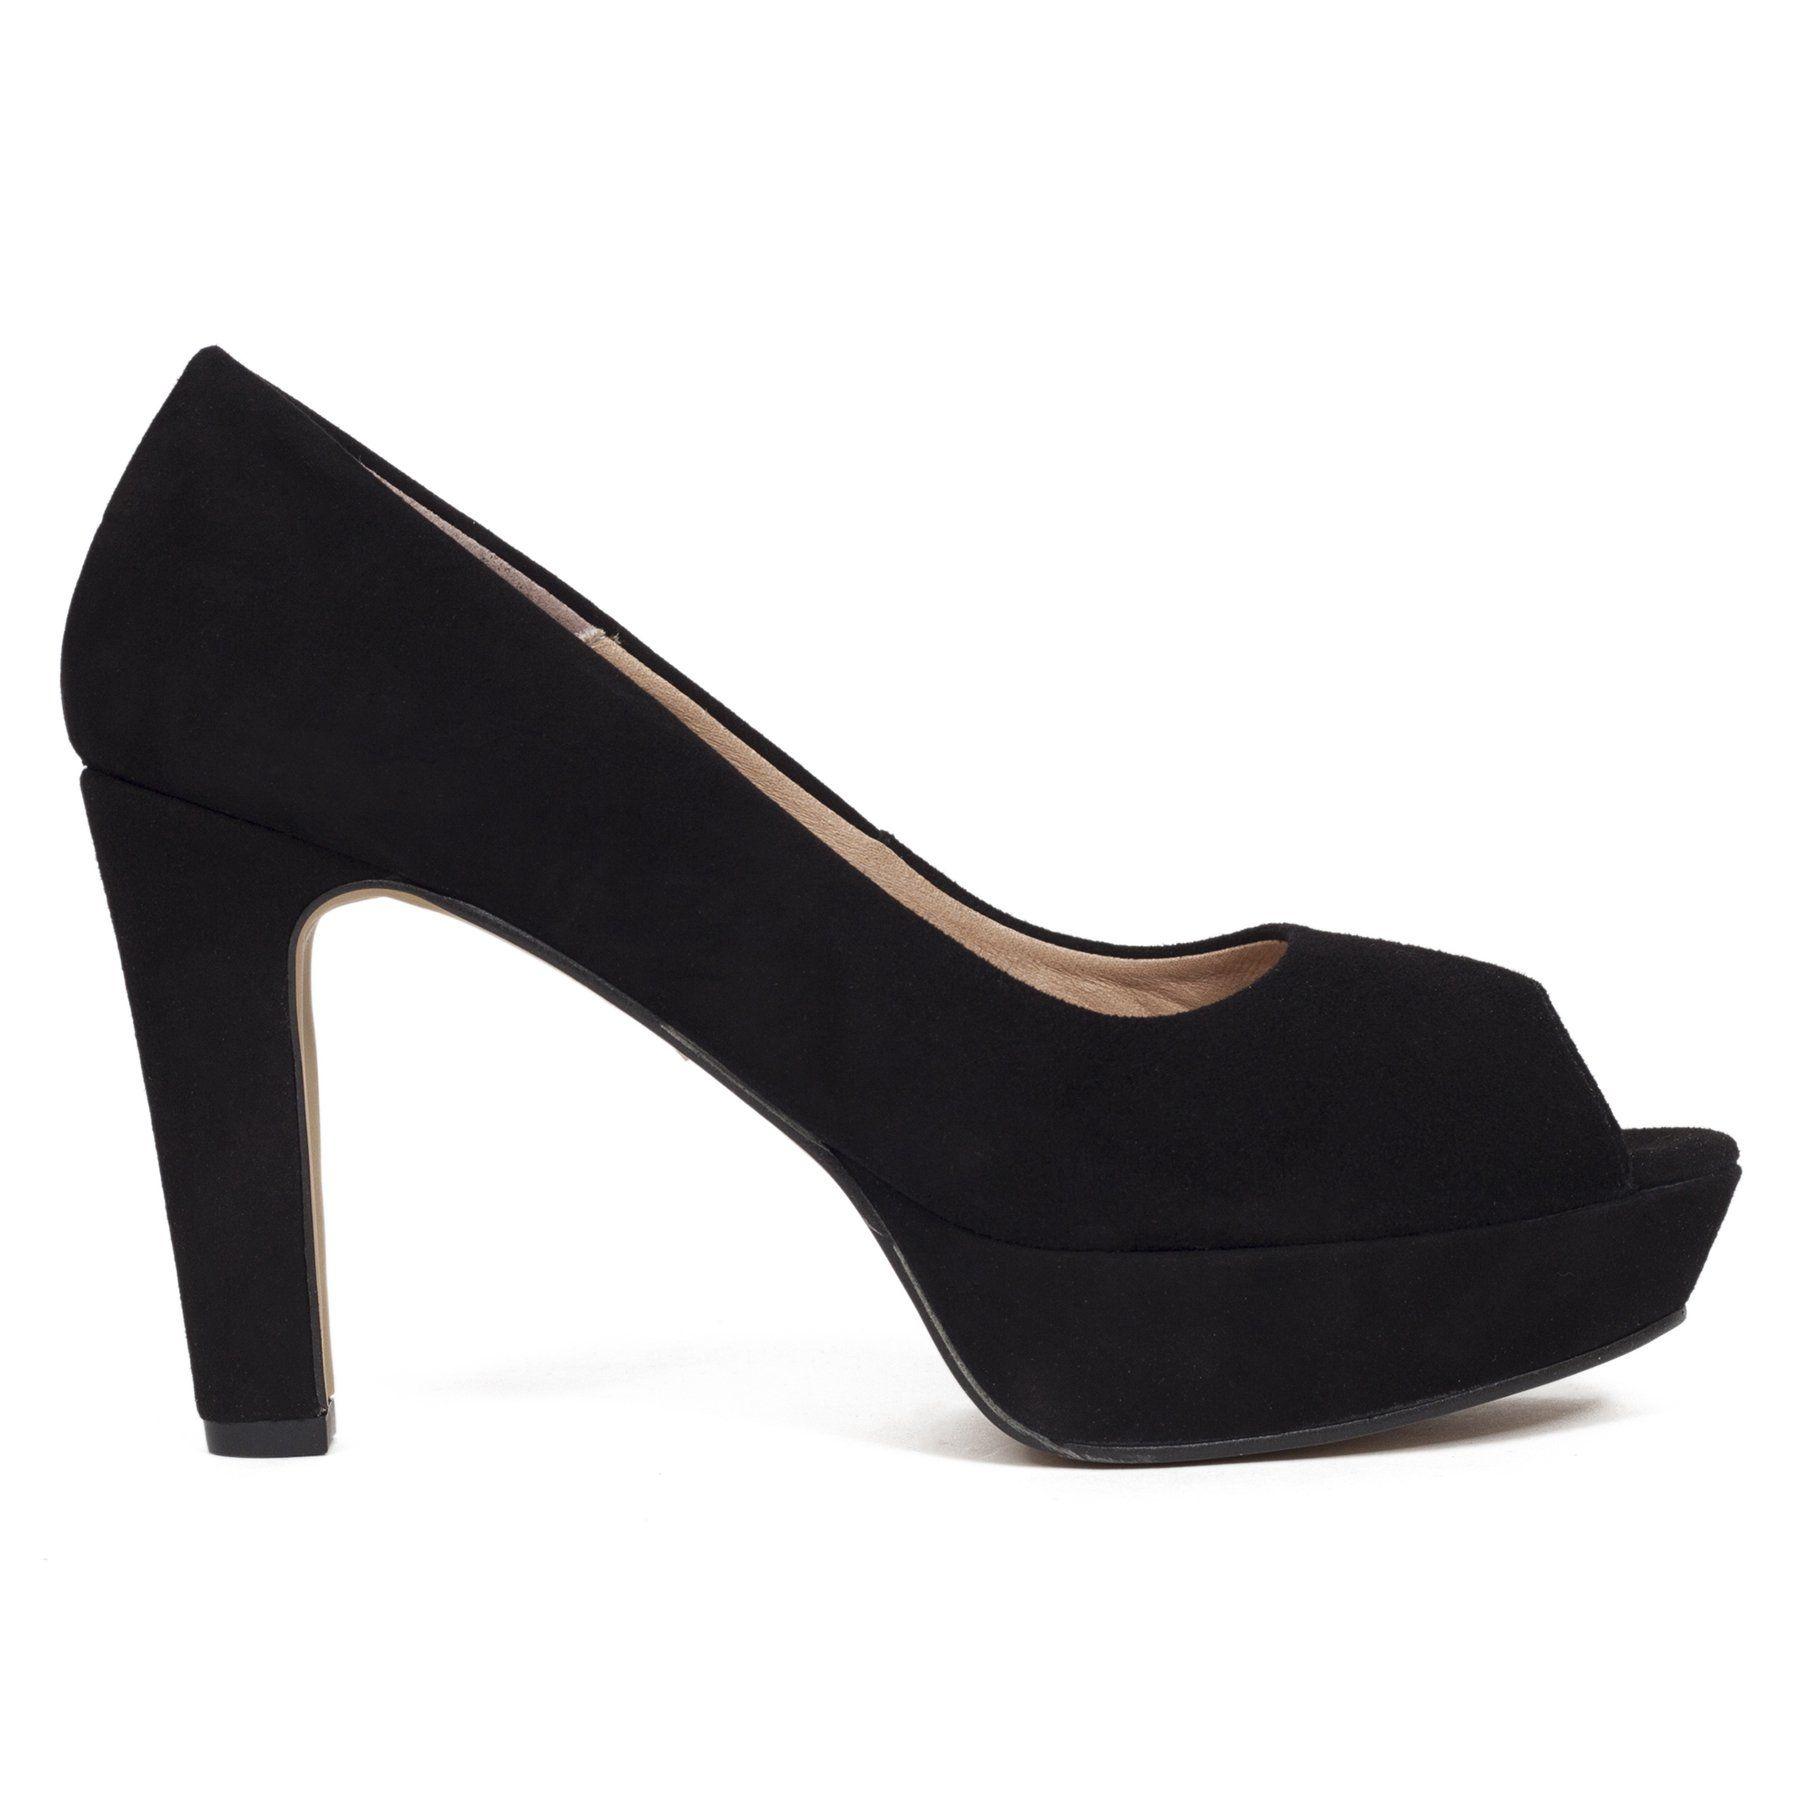 Heels Shoes Comfort High Makeup Mimao Women Urban Color Taupe qSVGzpUM